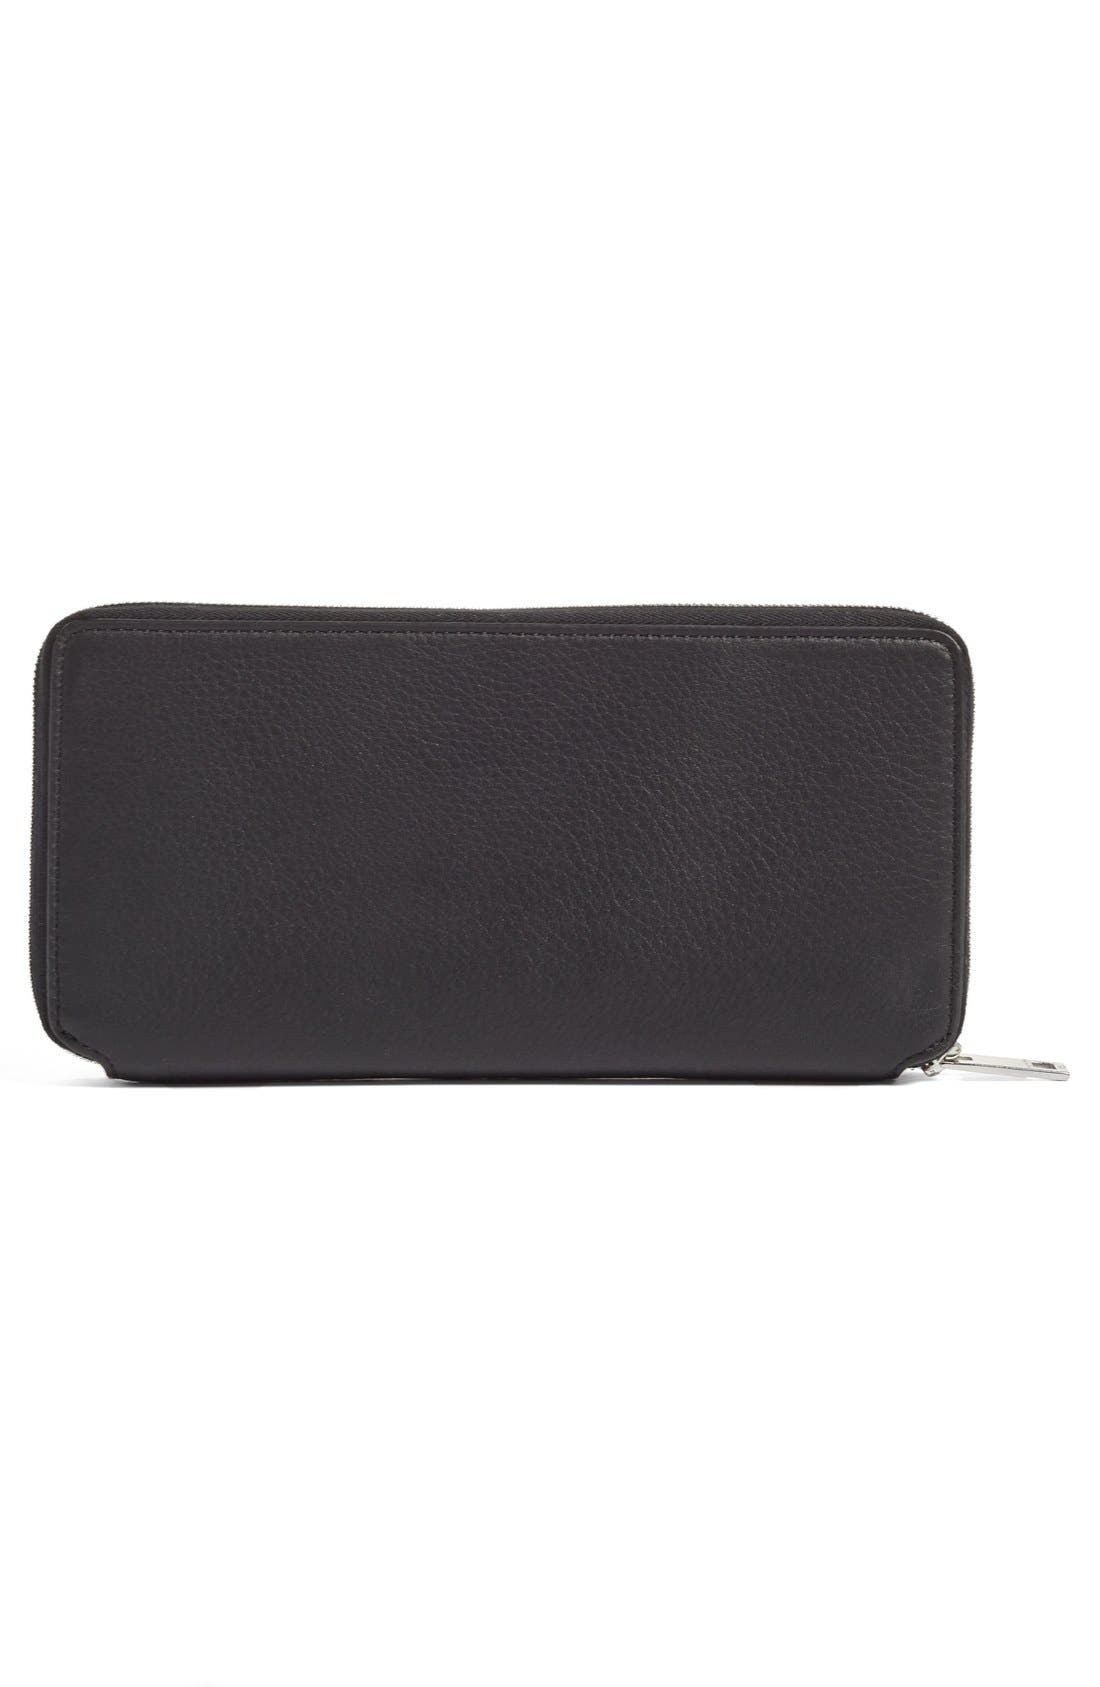 Leather Zip Around Wallet,                             Alternate thumbnail 4, color,                             Black